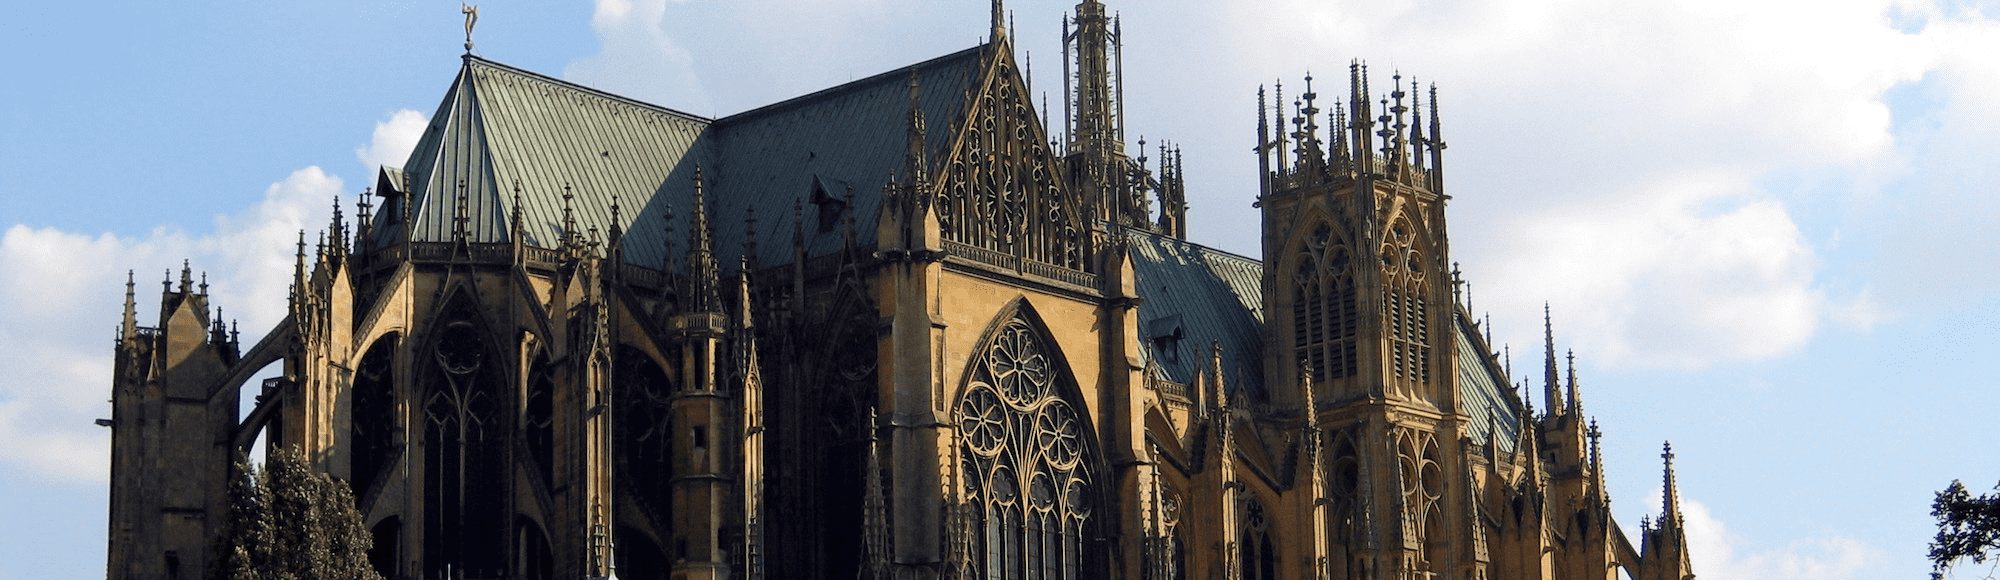 Metz Taxi Prices & Fare Calculator | Estimate Journey Costs | BetterTaxi